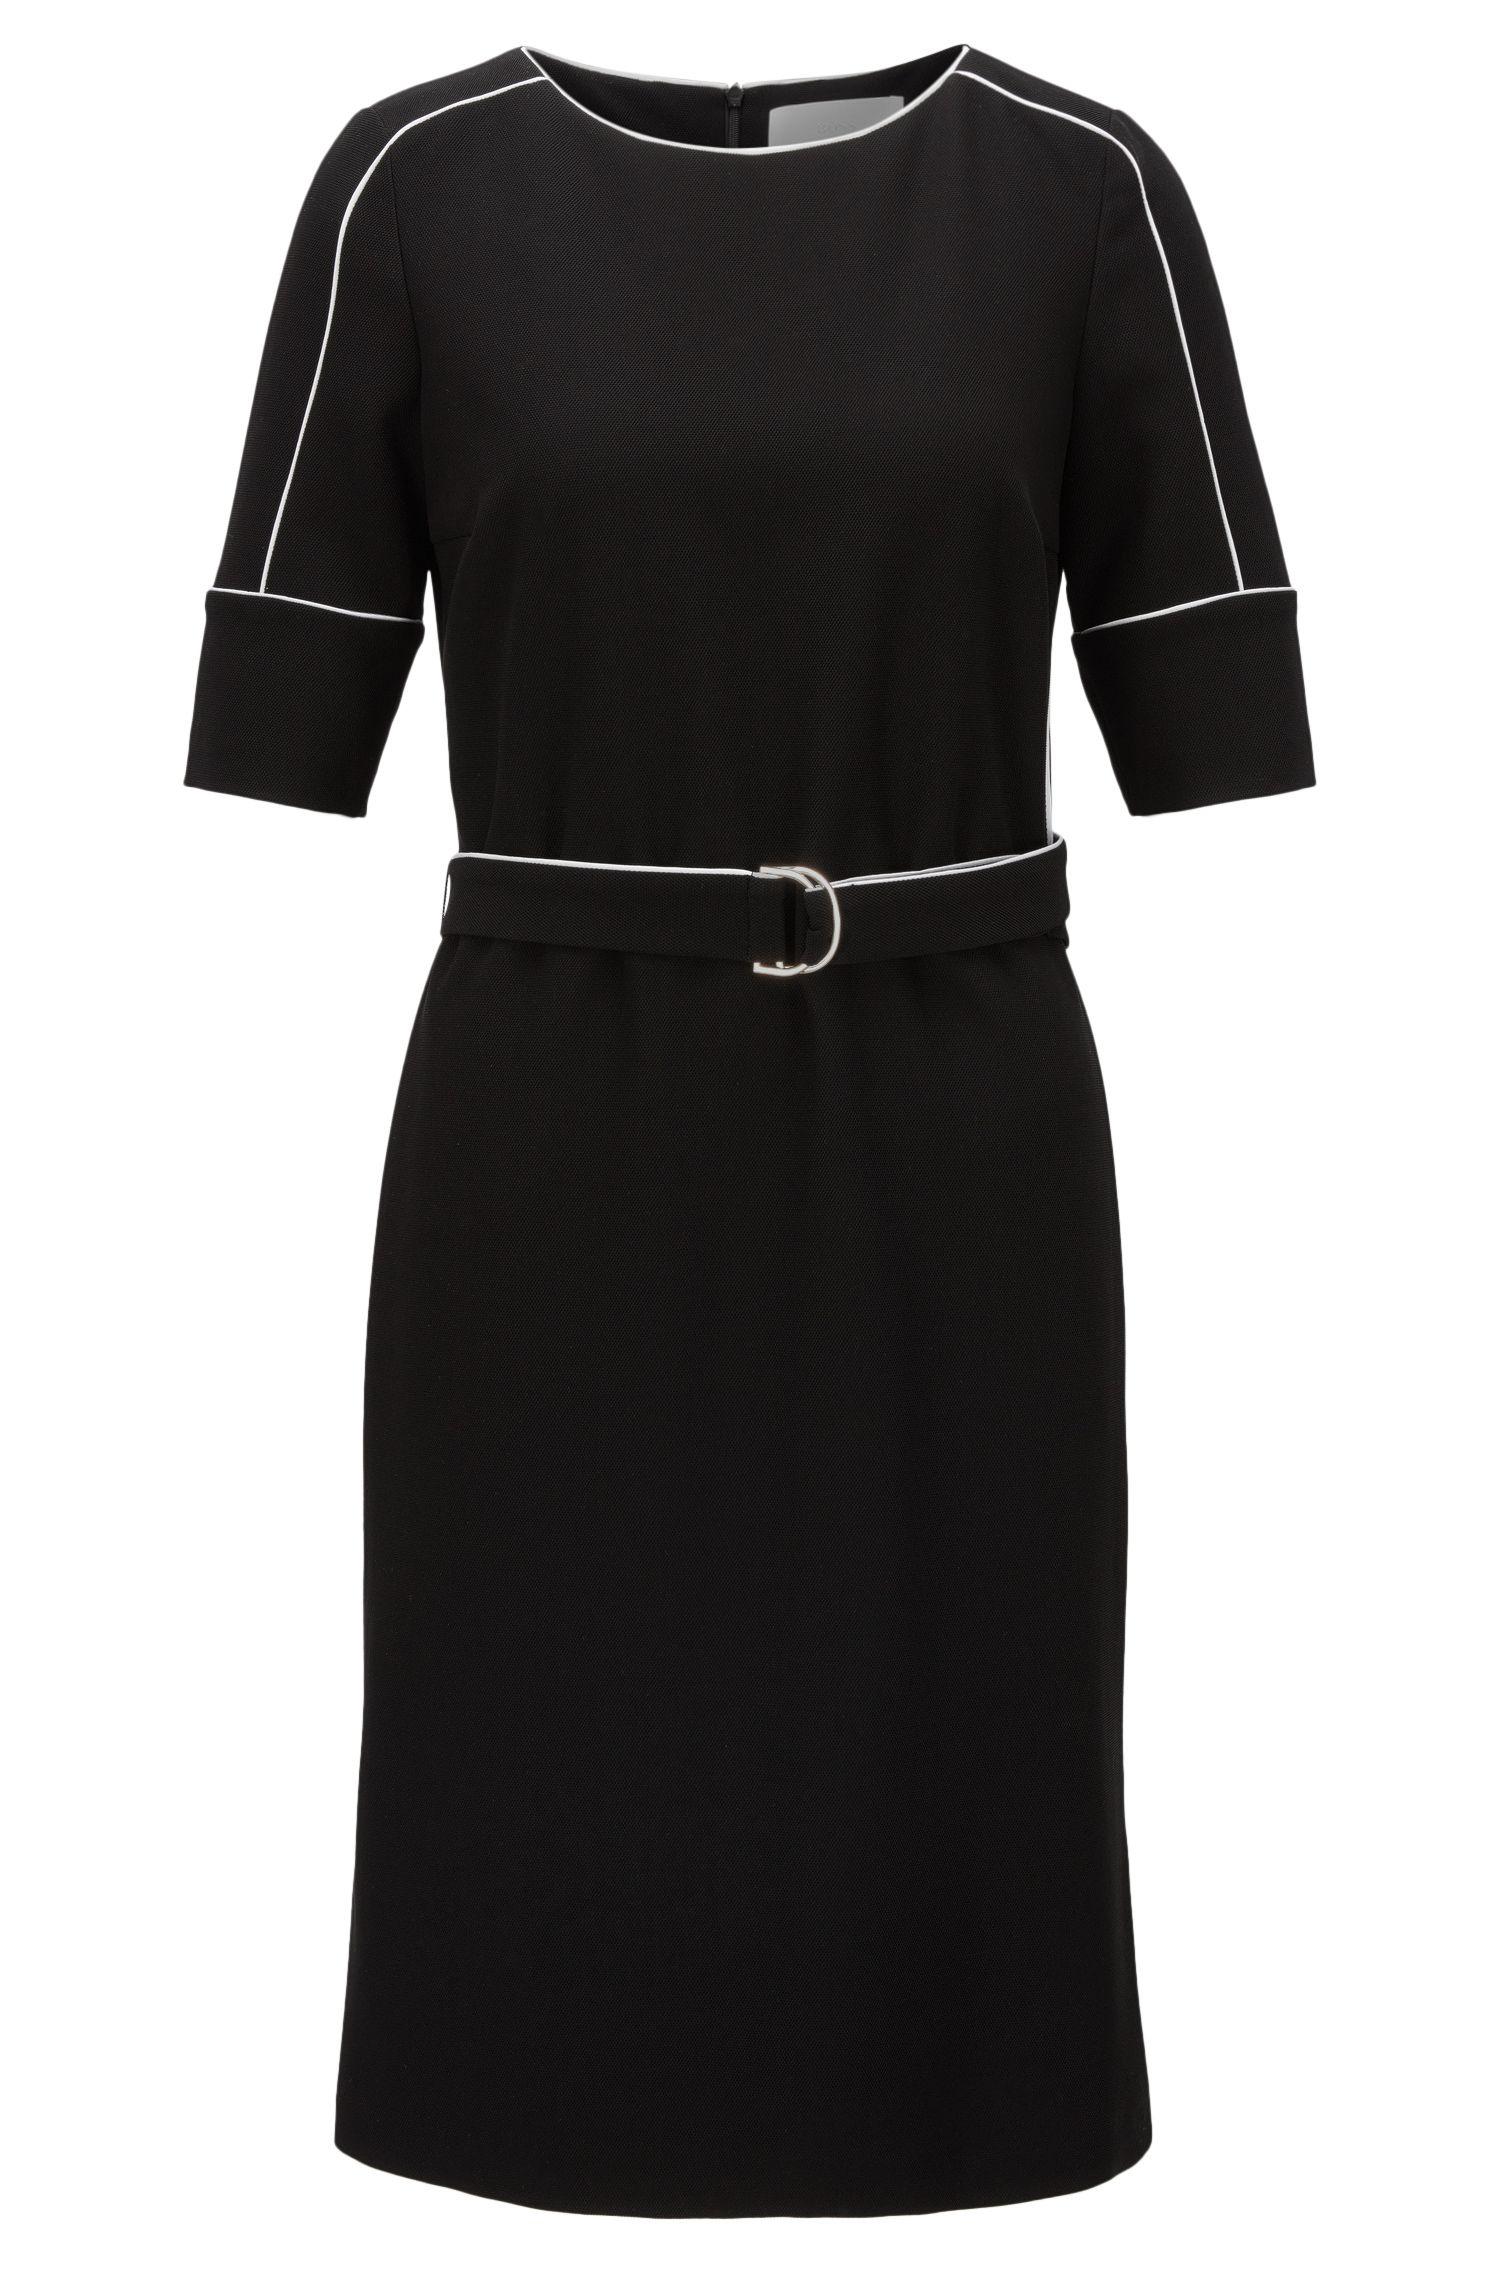 Relaxed-Fit-Kleid aus Material-Mix mit kontrastfarbenen Paspeln